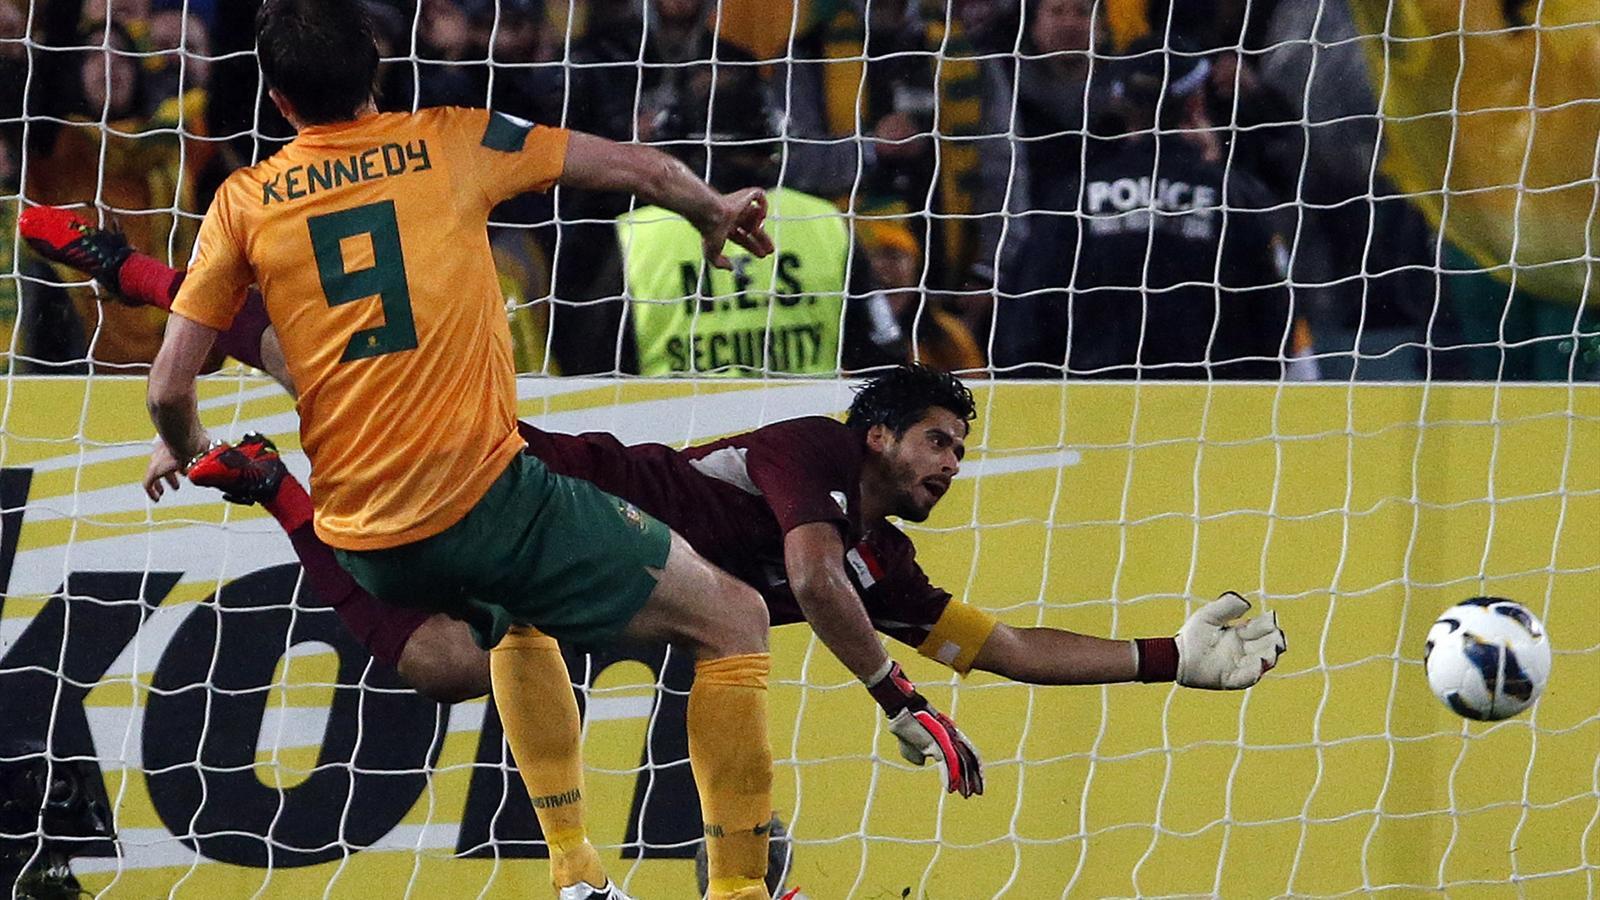 Josh kennedy l scores a goal as iraq s goalkeeper noor sabri dives